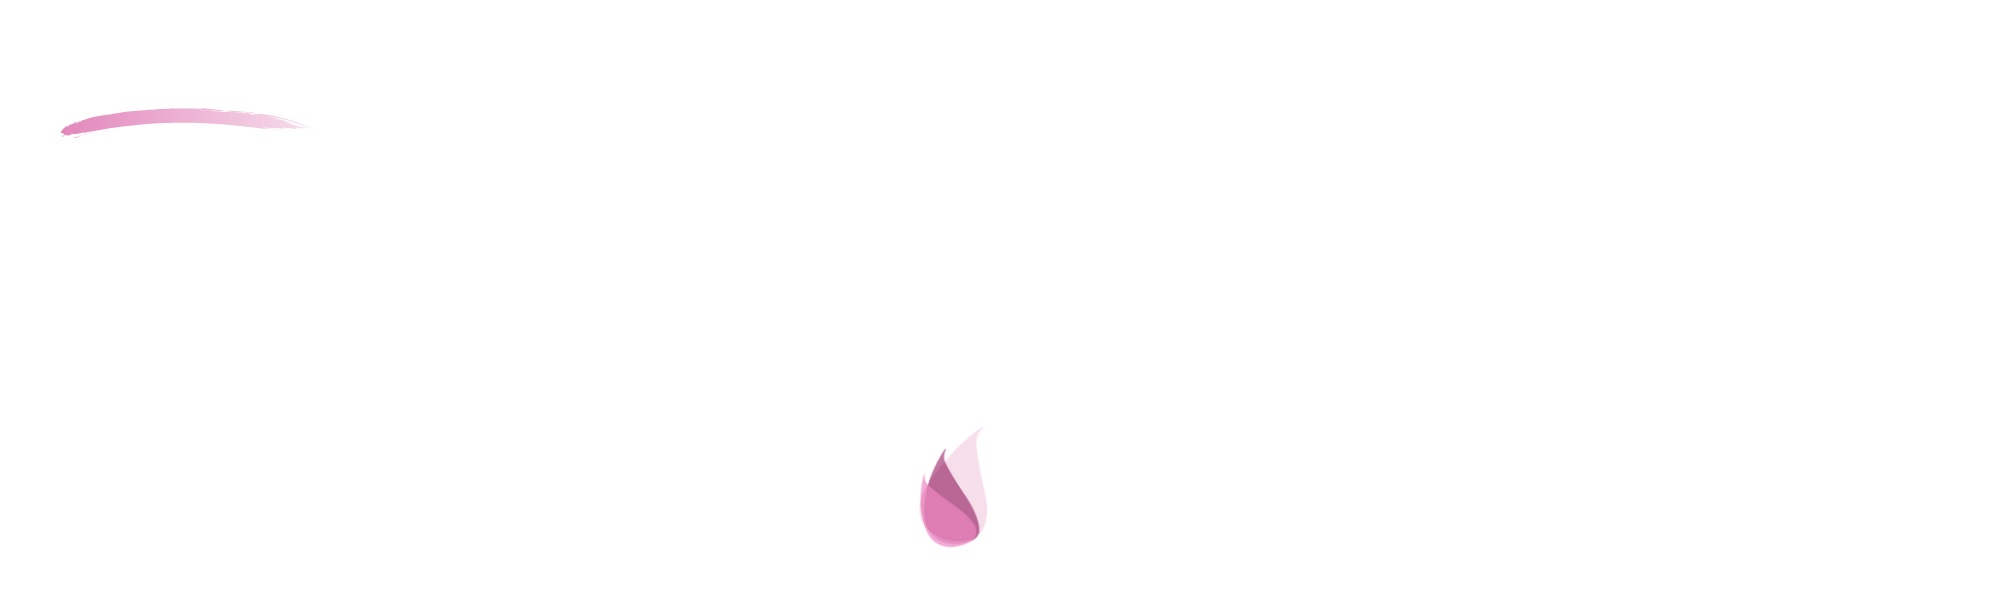 Prenatal & Postpartum Yoga